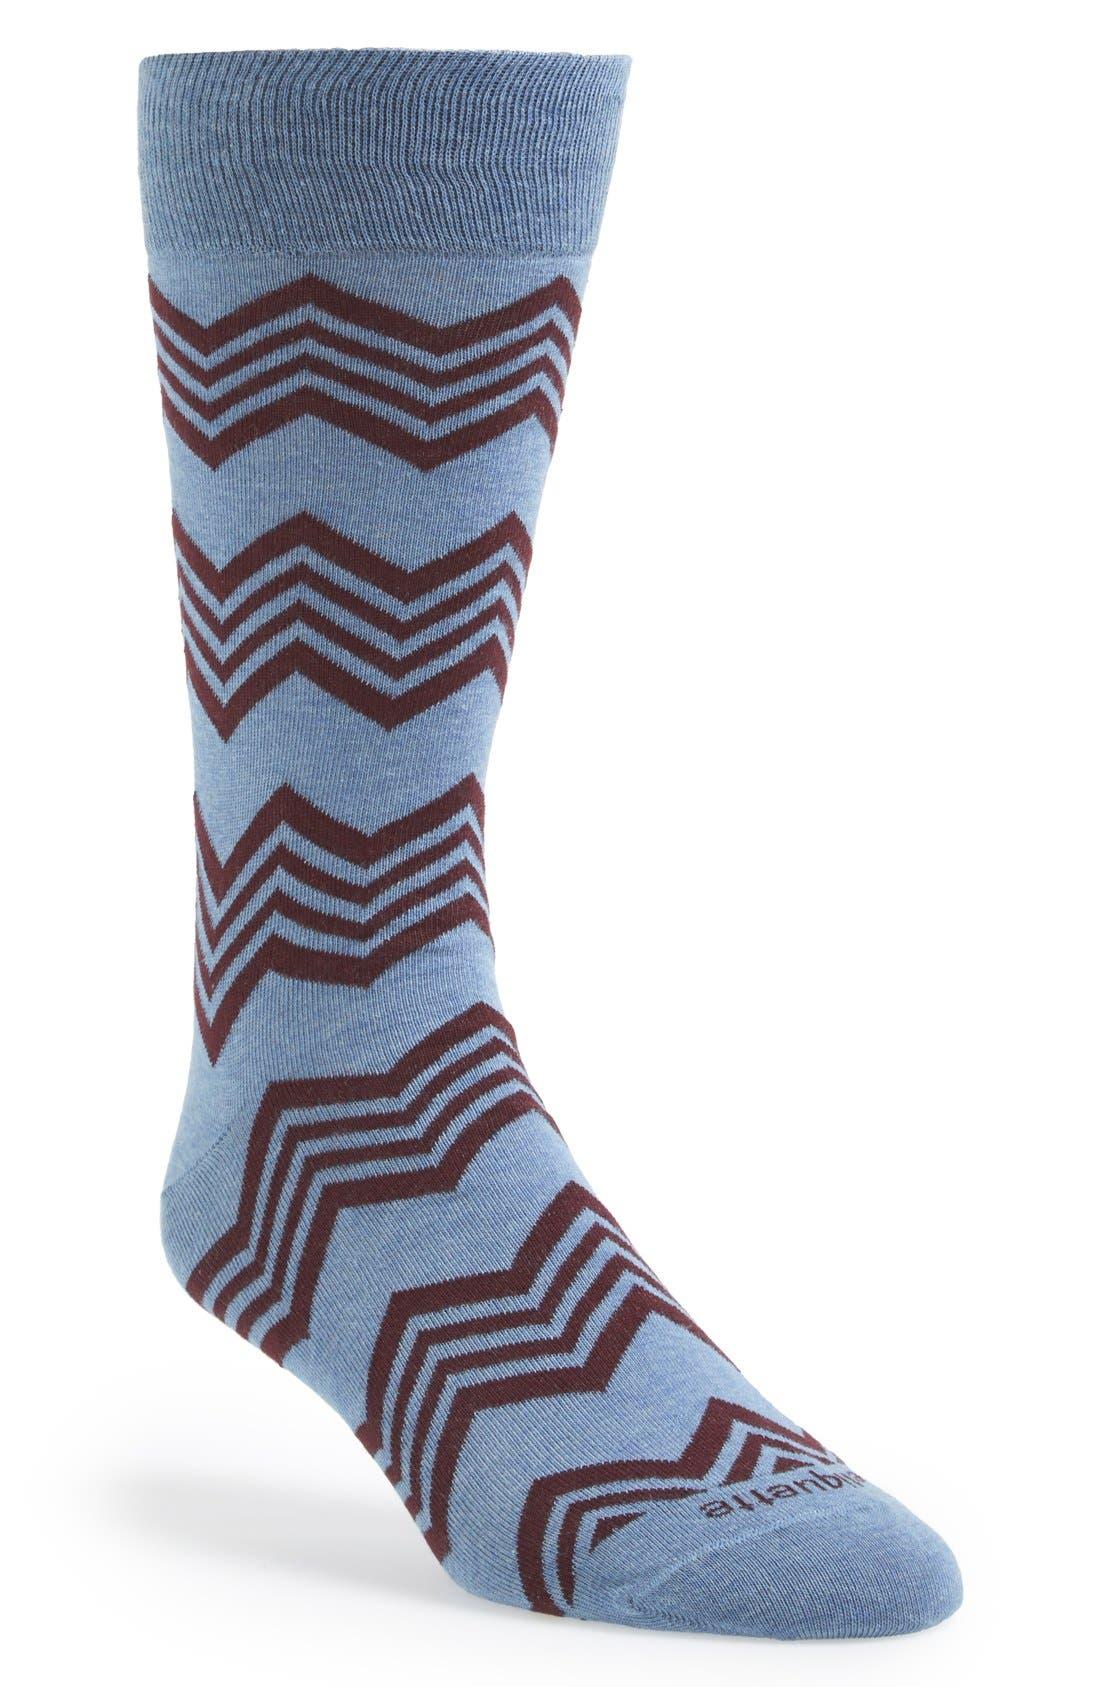 Main Image - Etiquette Clothiers 'Alpine' Stripe Socks